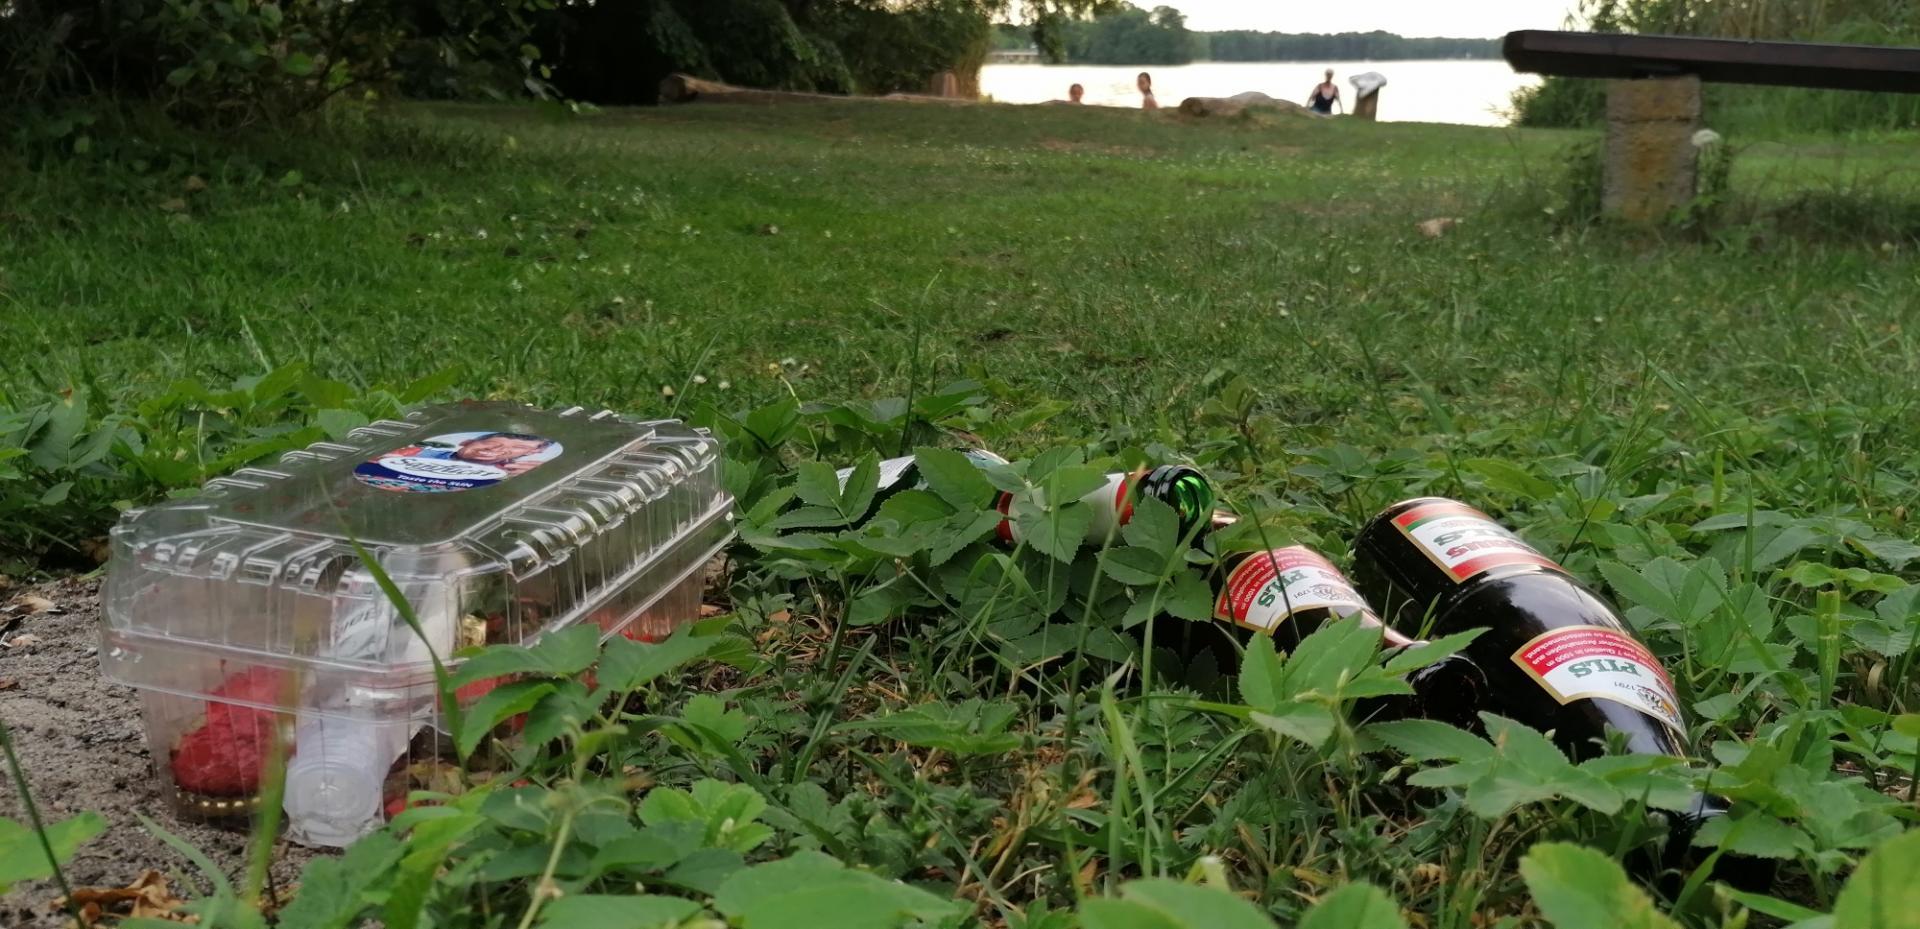 Müll am Klein Köriser See. Foto: Dörthe Ziemer